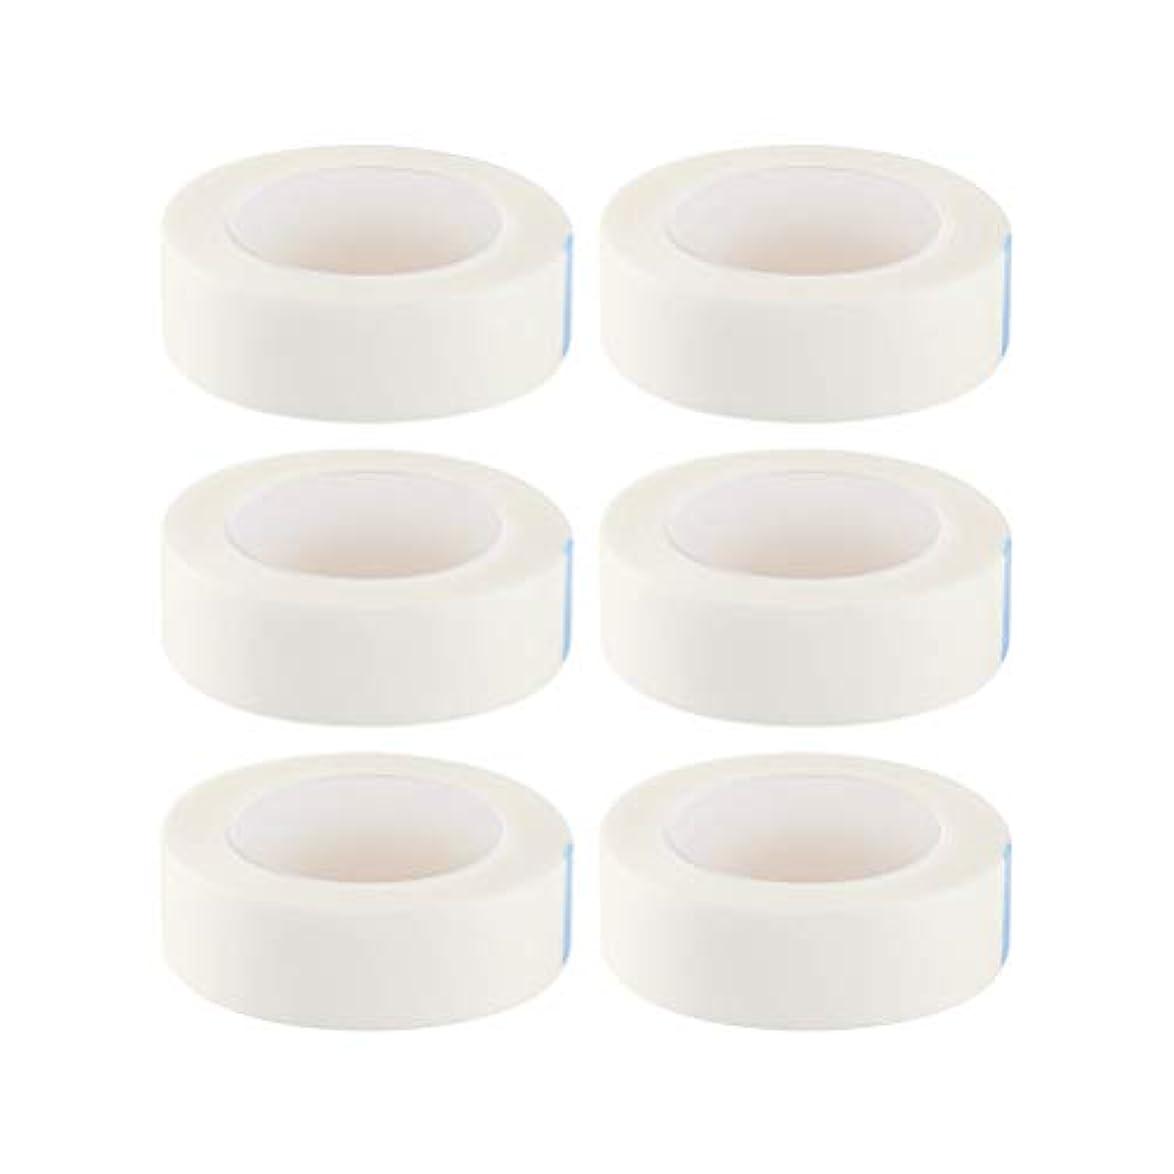 HEALIFTY まつげ絶縁テープまつげエクステサロン用ロール12個入り(白)